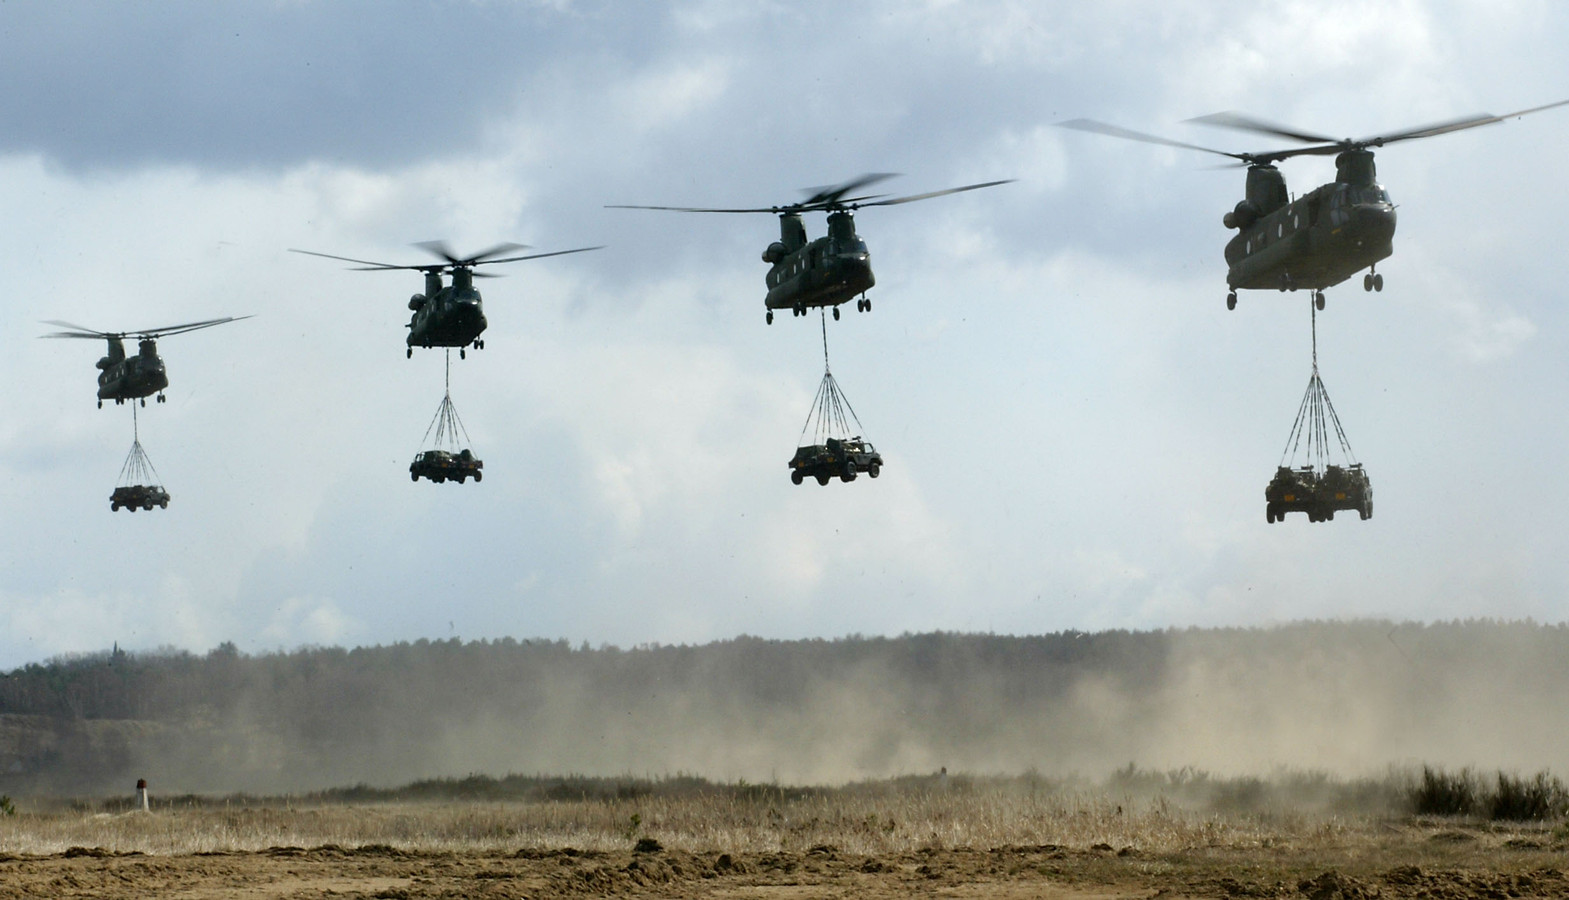 Vier Chinook helikopters